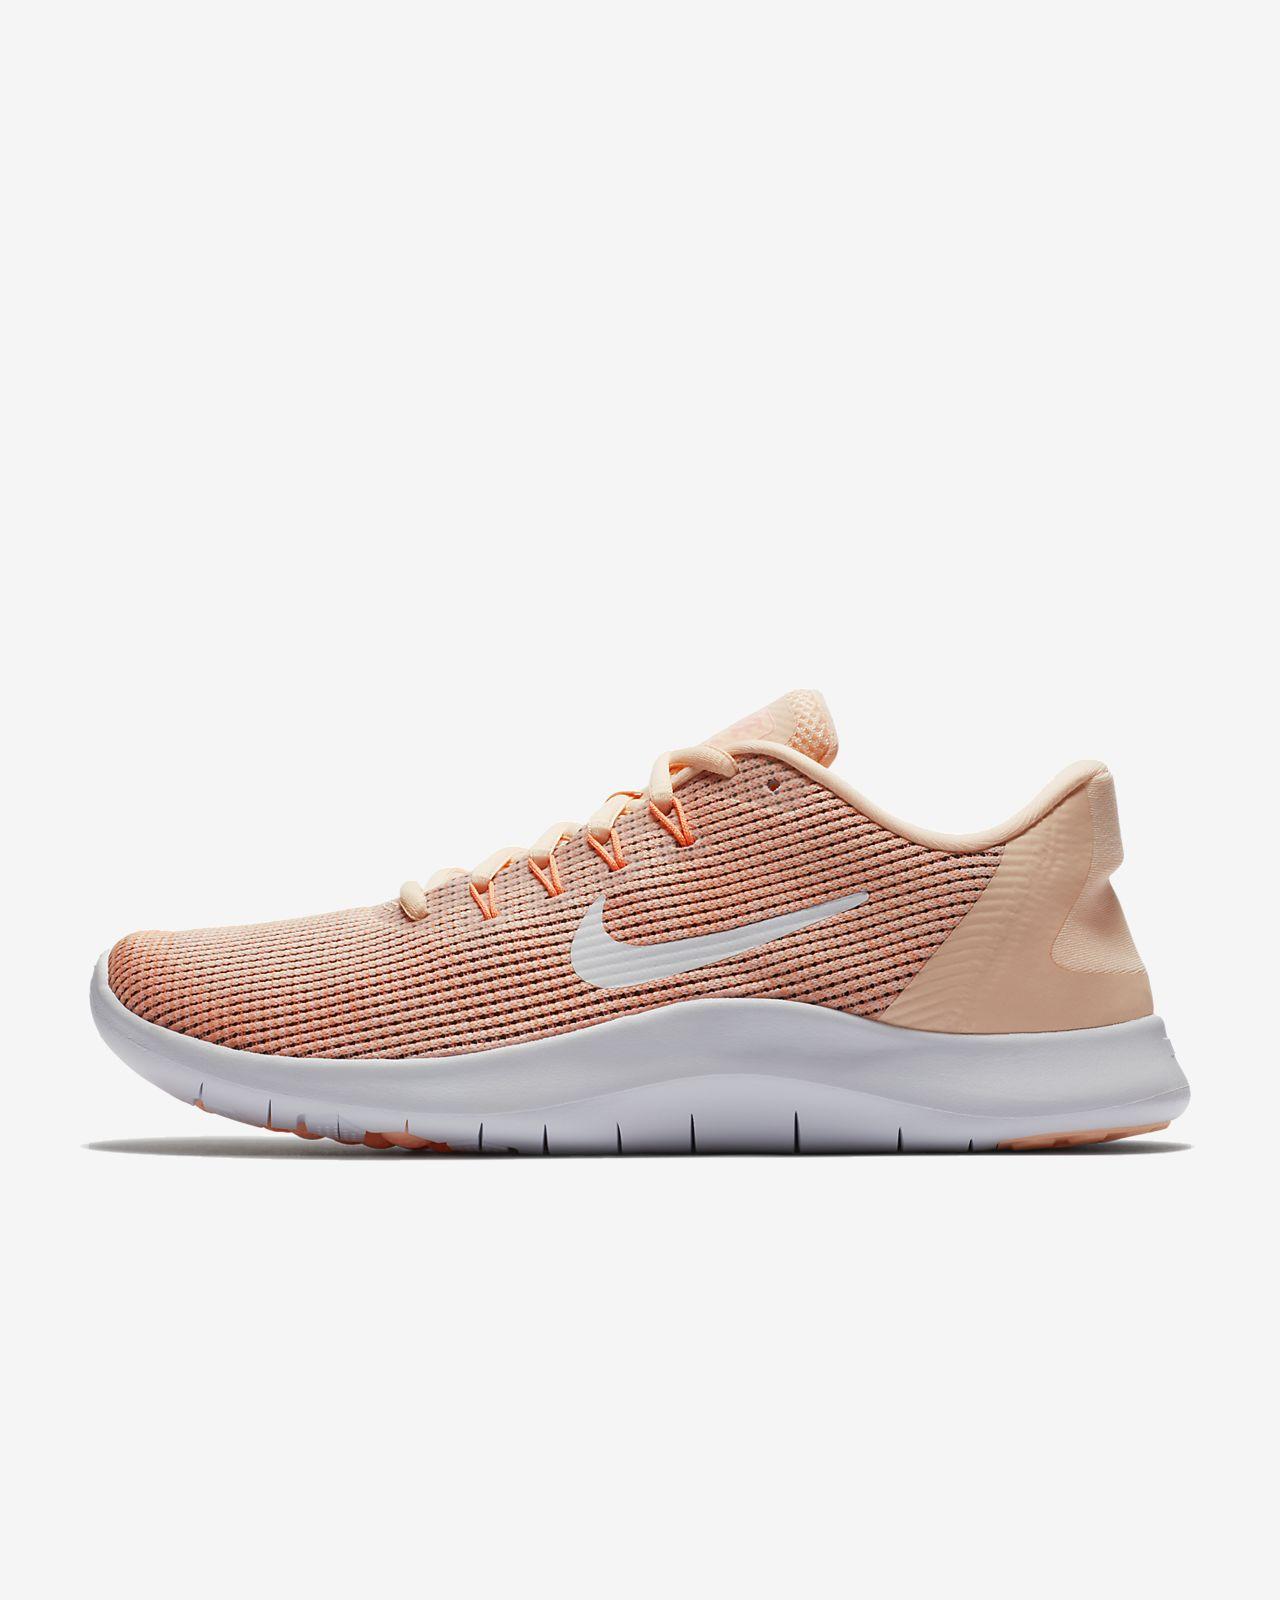 Nike PerformanceFLEX 2018 RN - Trainers - anthracite/hyper pink/wolf grey 6hmJ3d7Y4